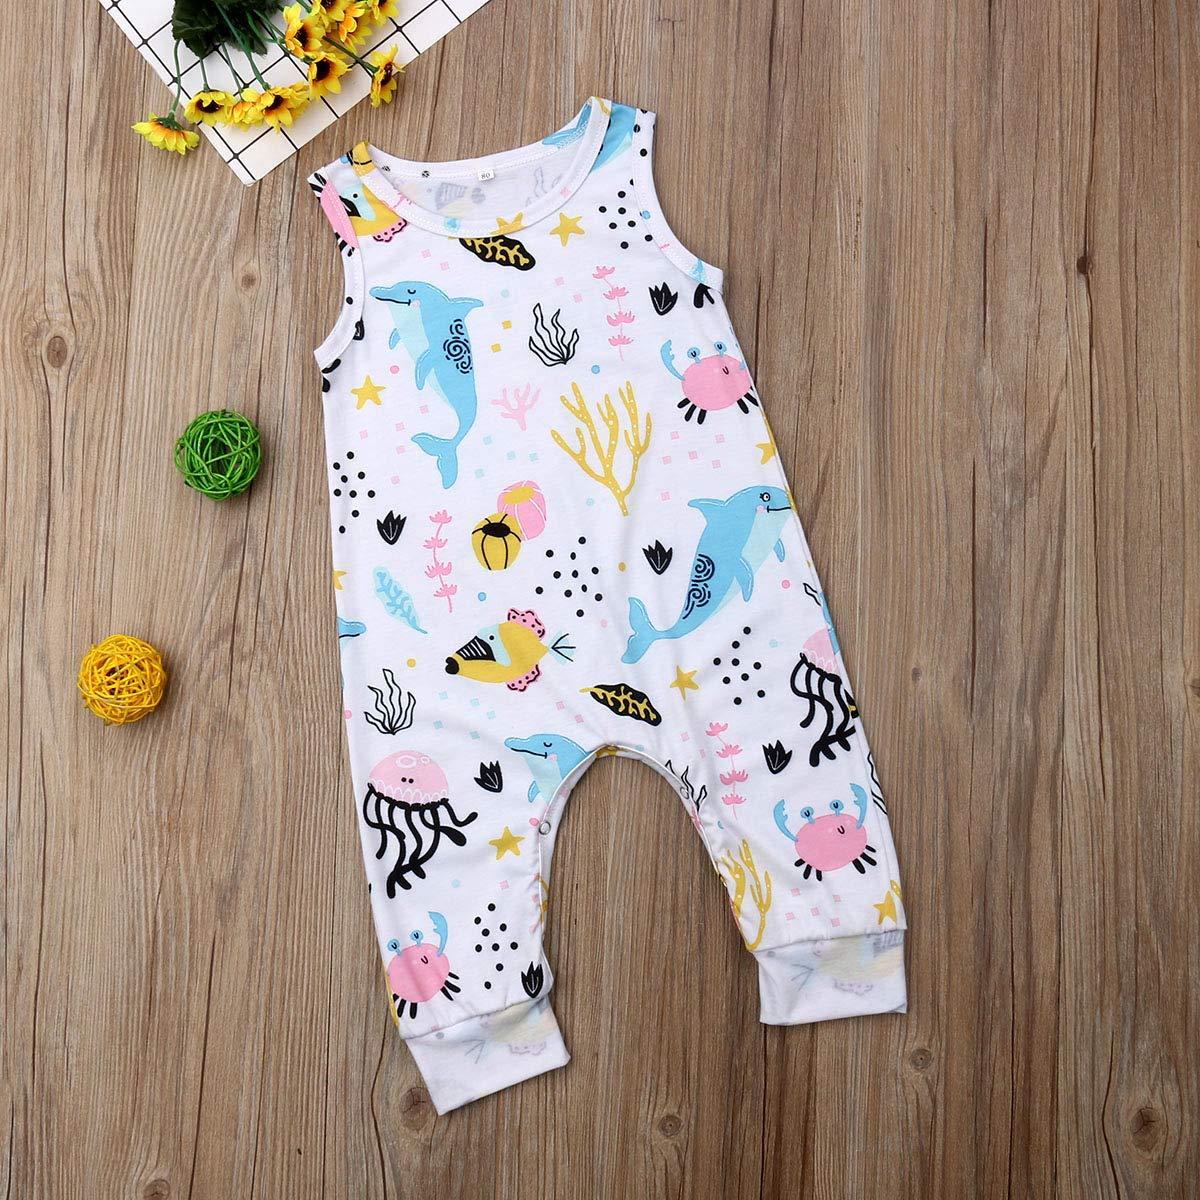 Annvivi Newborn Baby Boy Beast Mode Funny Saying Letter Romper Sleeveless Jumpsuit